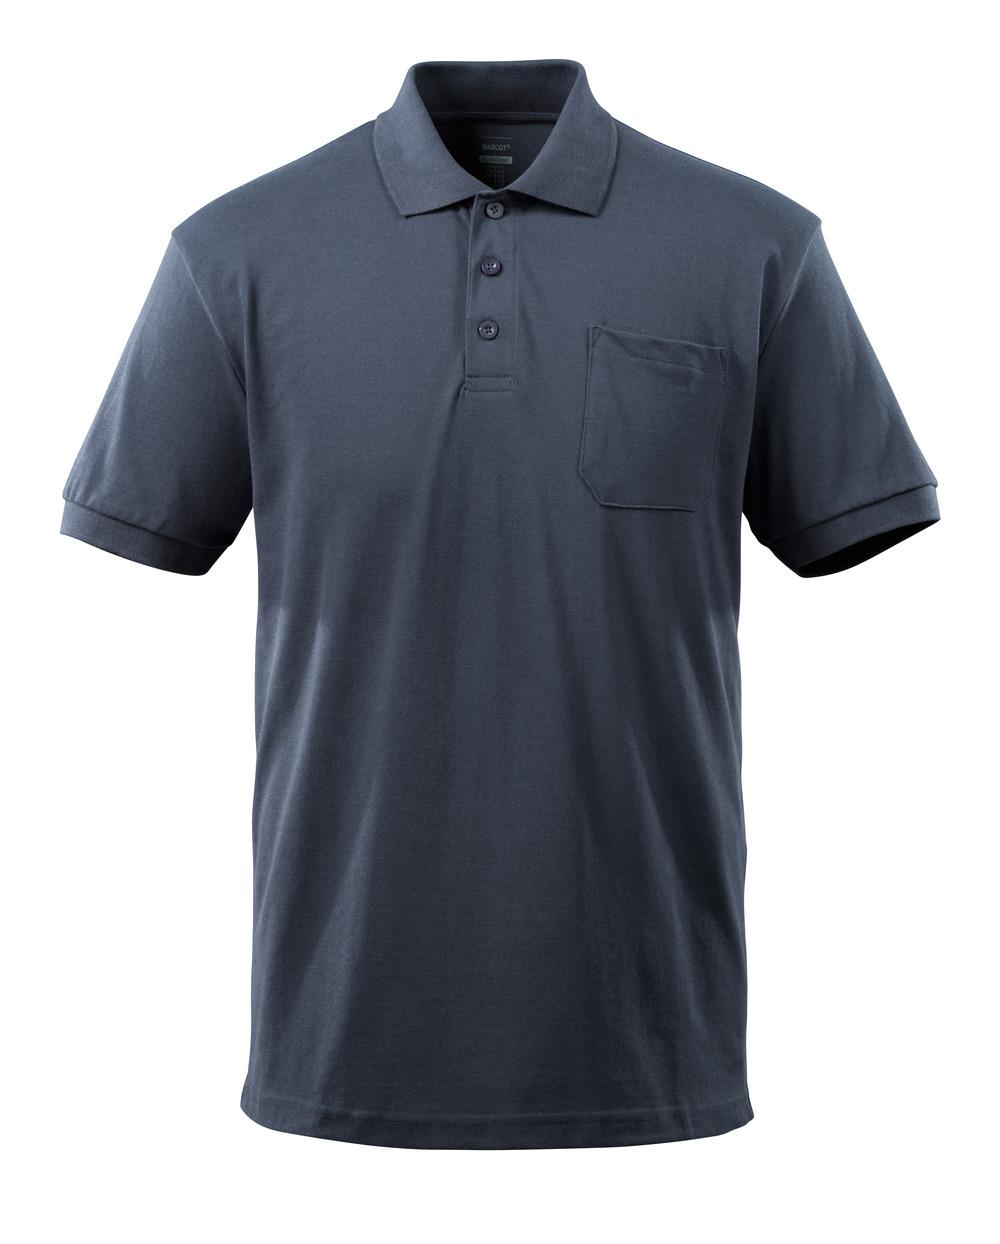 51586-968-010 Pikéskjorte med brystlomme - mørk marine